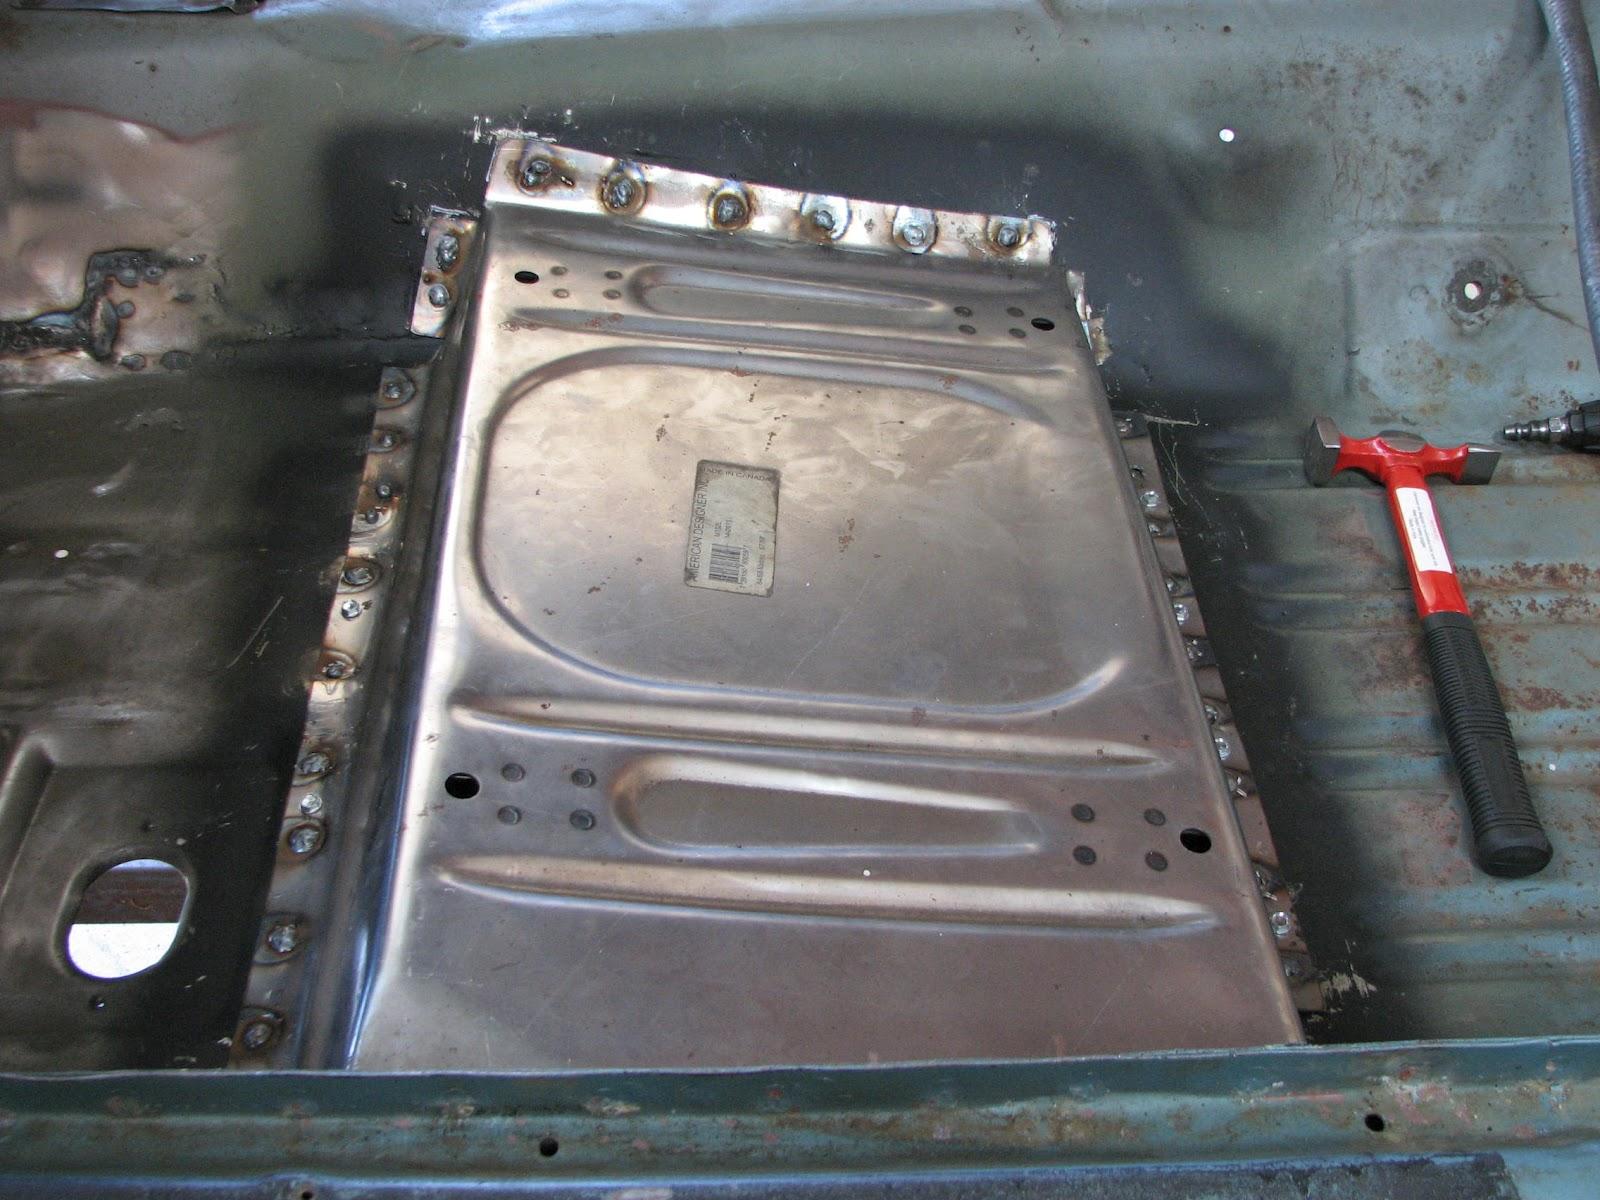 1968 mustang fastback resurrection floor repair part 3 for 1968 mustang floor pan replacement